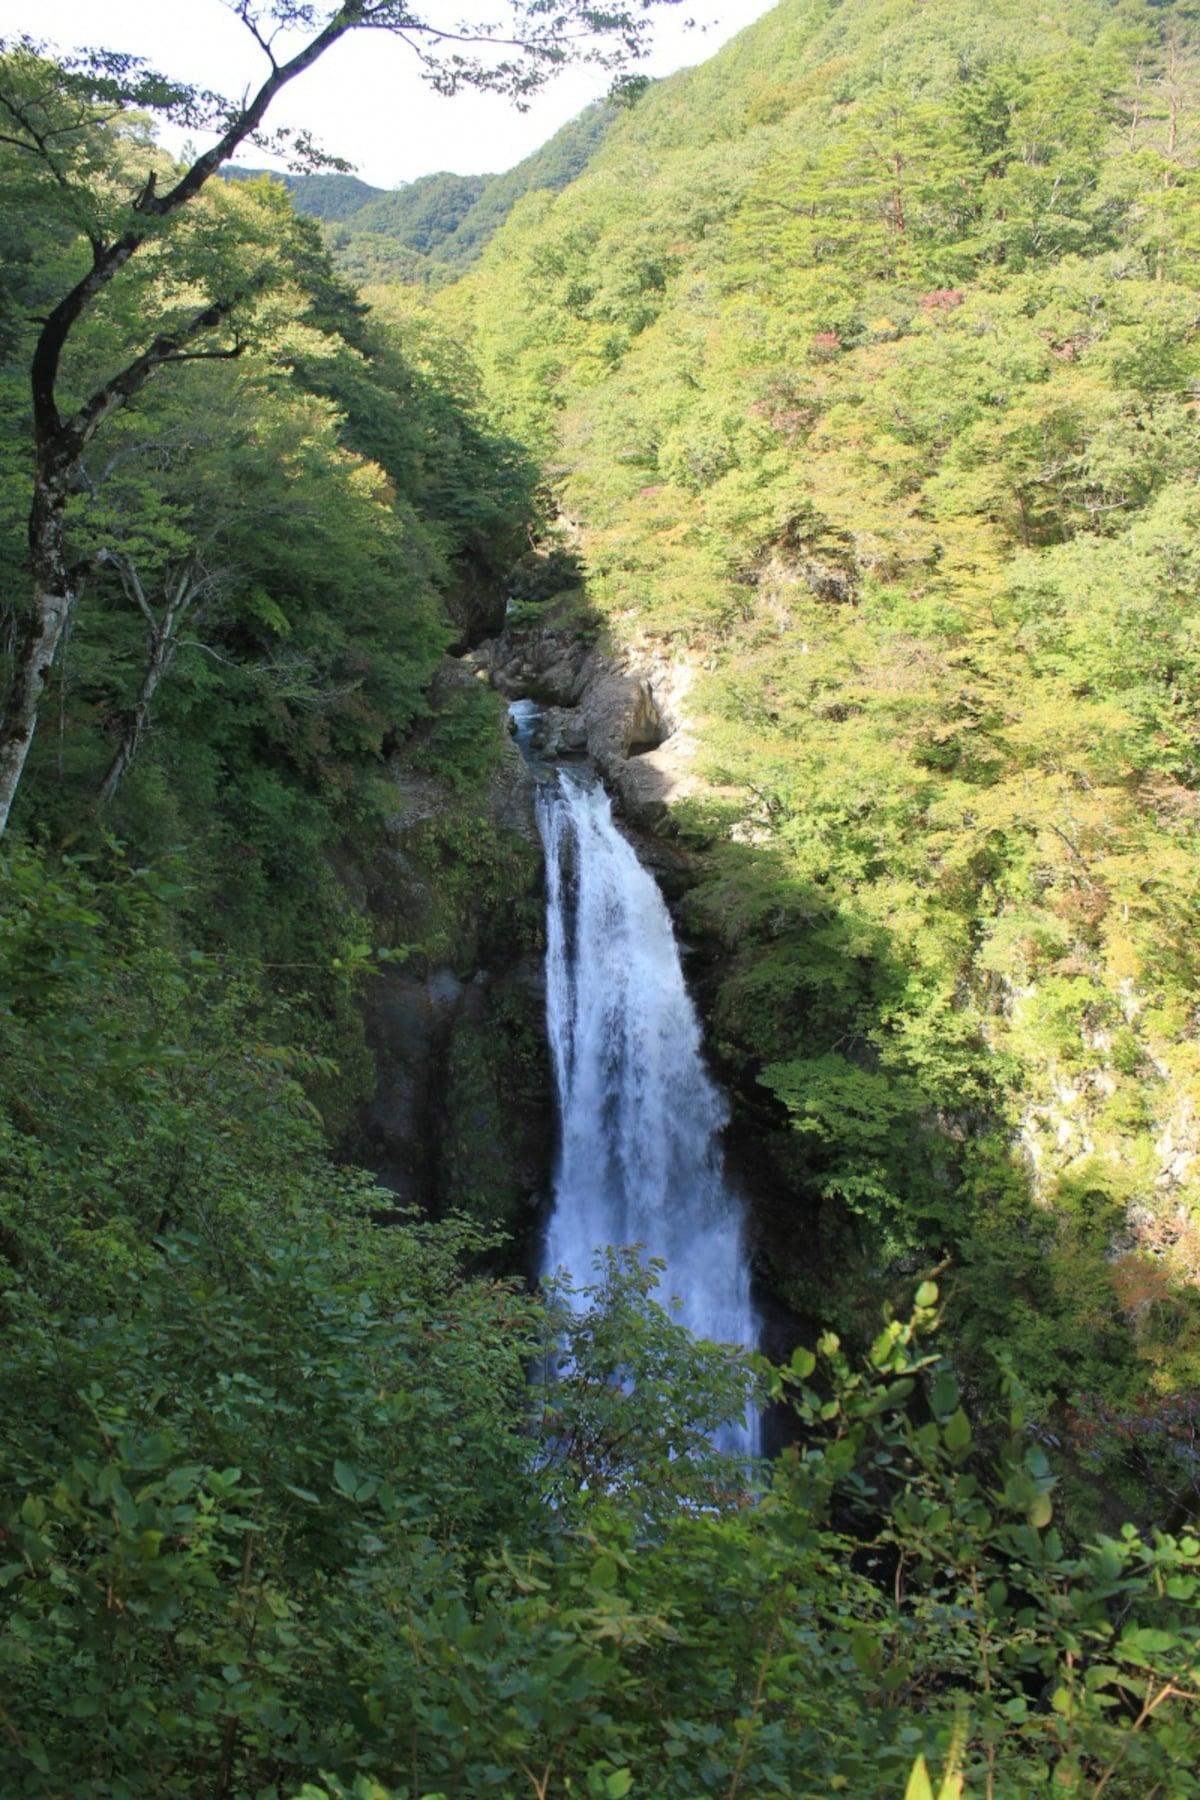 Day 2: Akiu Falls